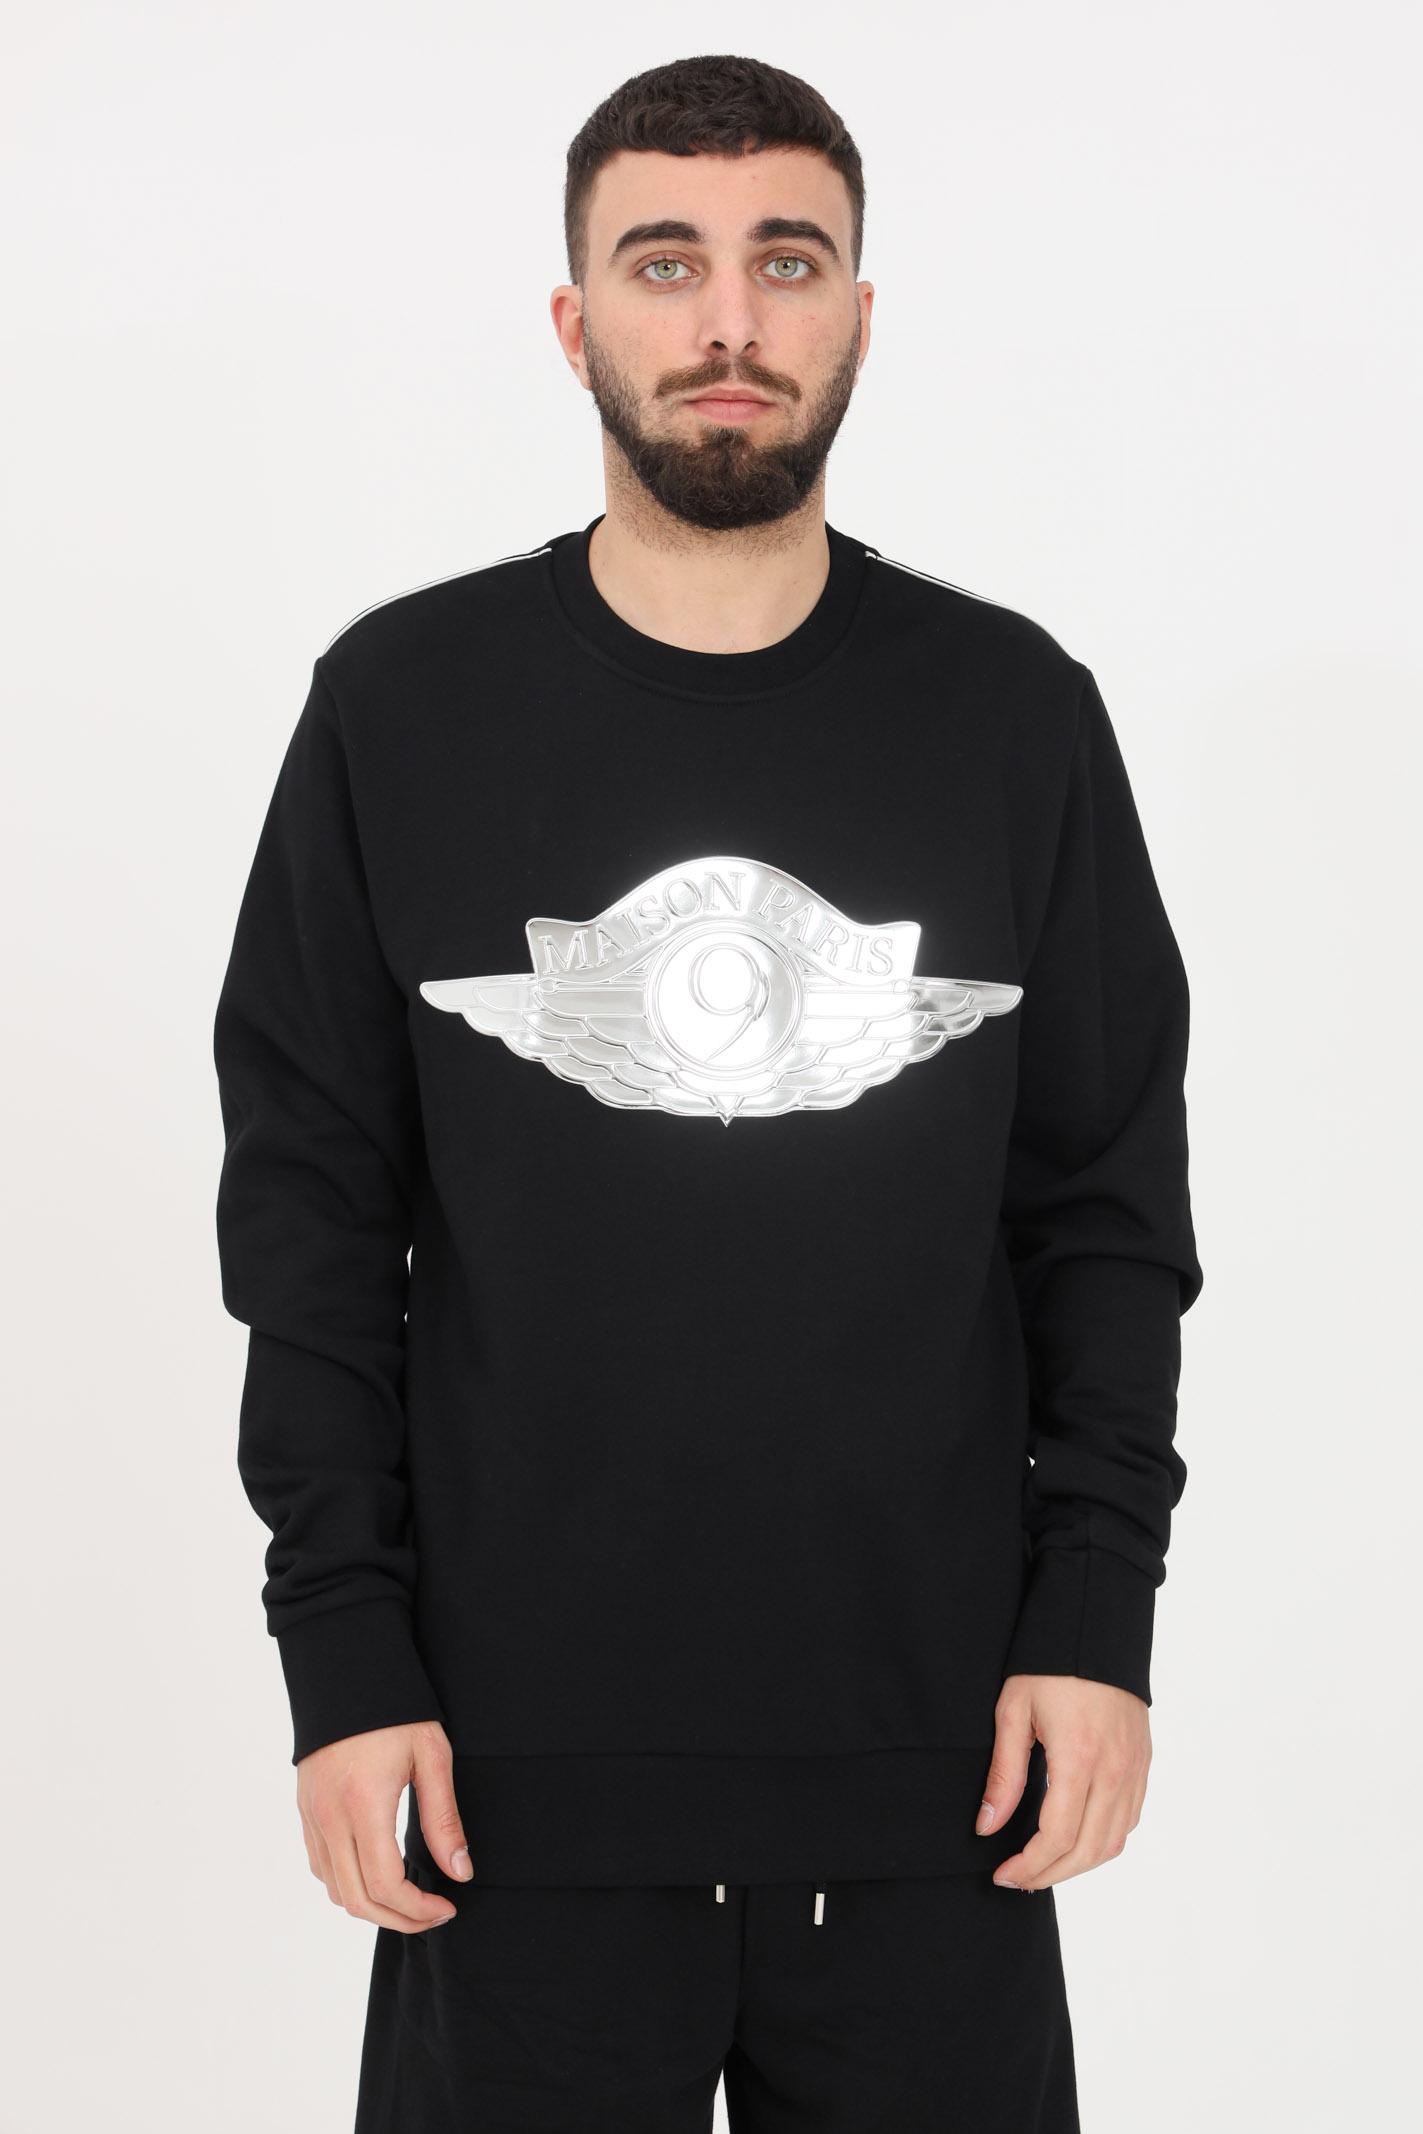 Black crew neck sweatshirt. Maison 9 paris  MAISON 9 PARIS   Sweatshirt   M9F2107NERO